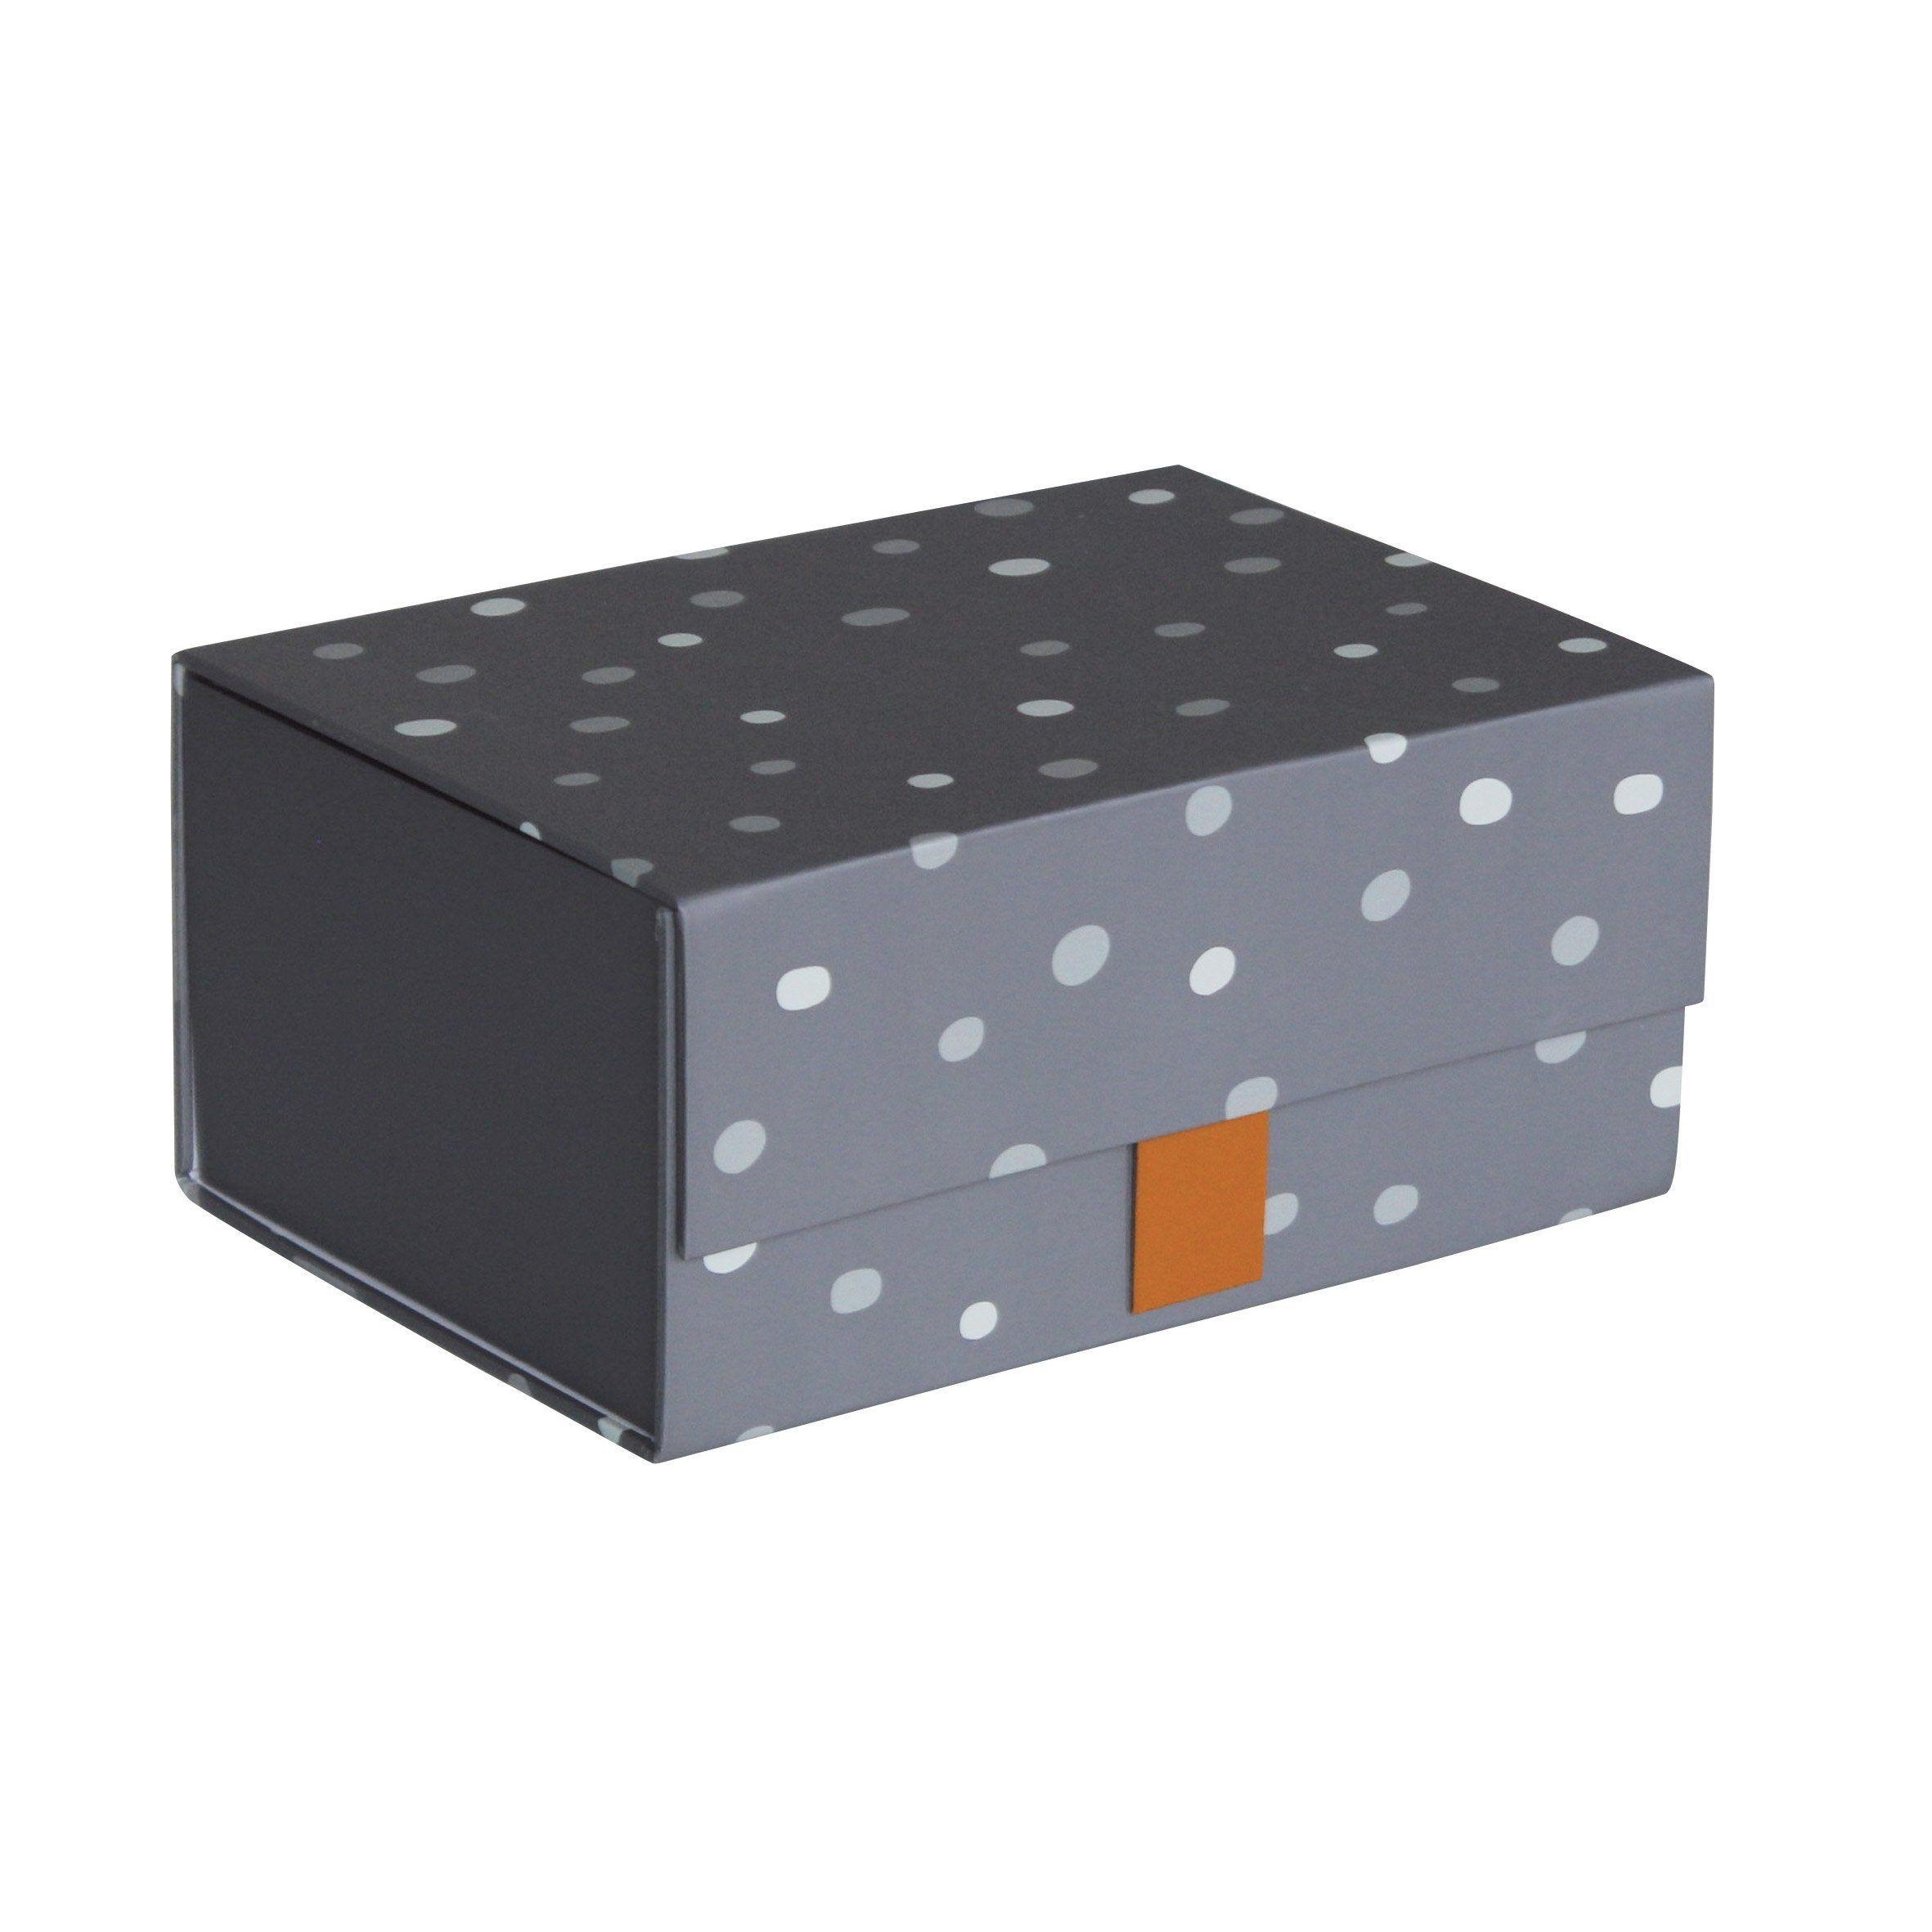 Boite De Rangement Avec Couvercle Carton Box Beyond Dots